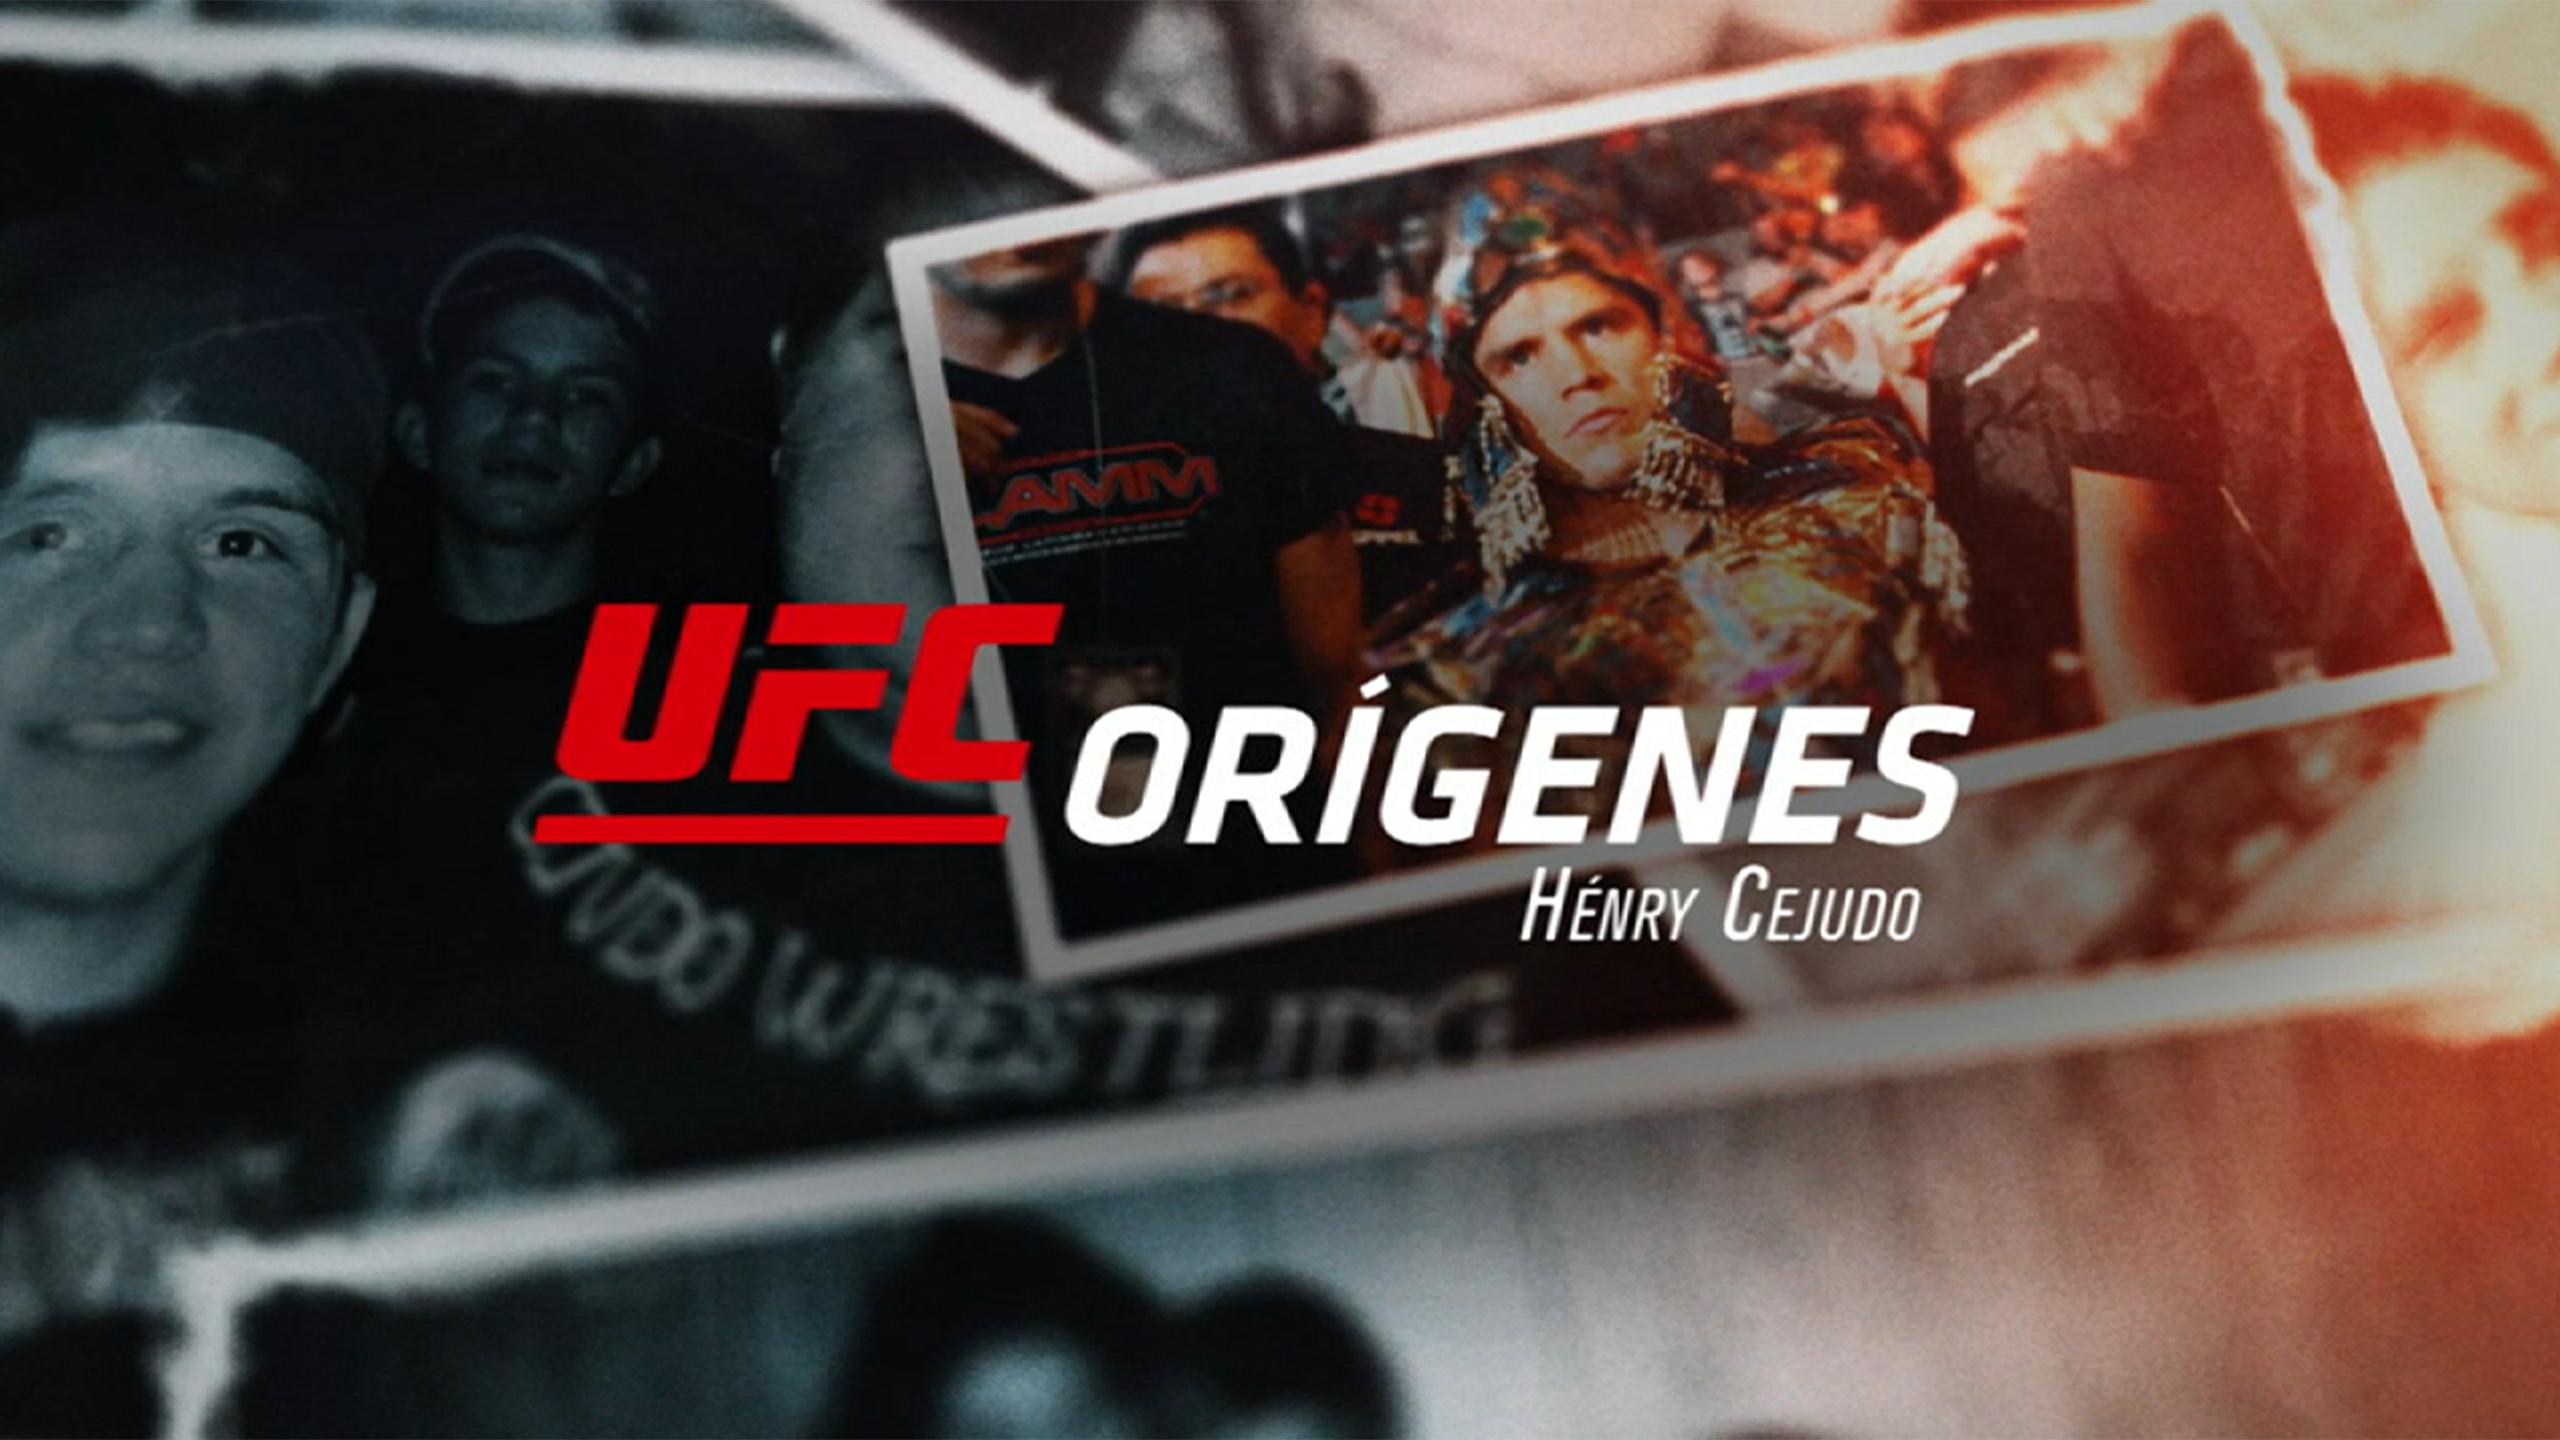 UFC Origenes: Henry Cejudo